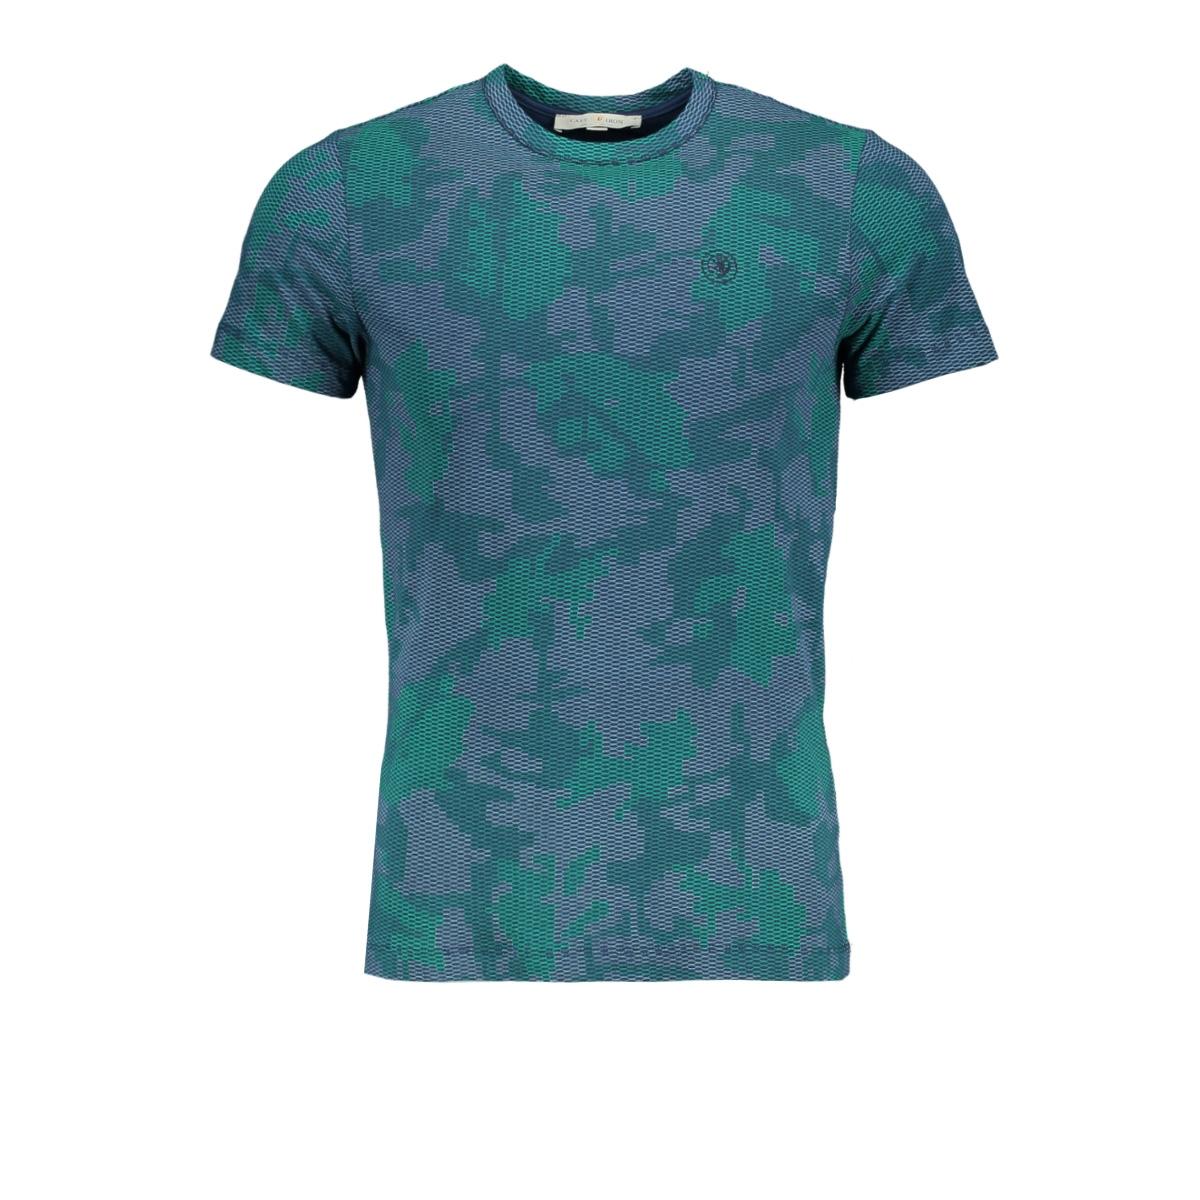 ctss188325 cast iron t-shirt 5057